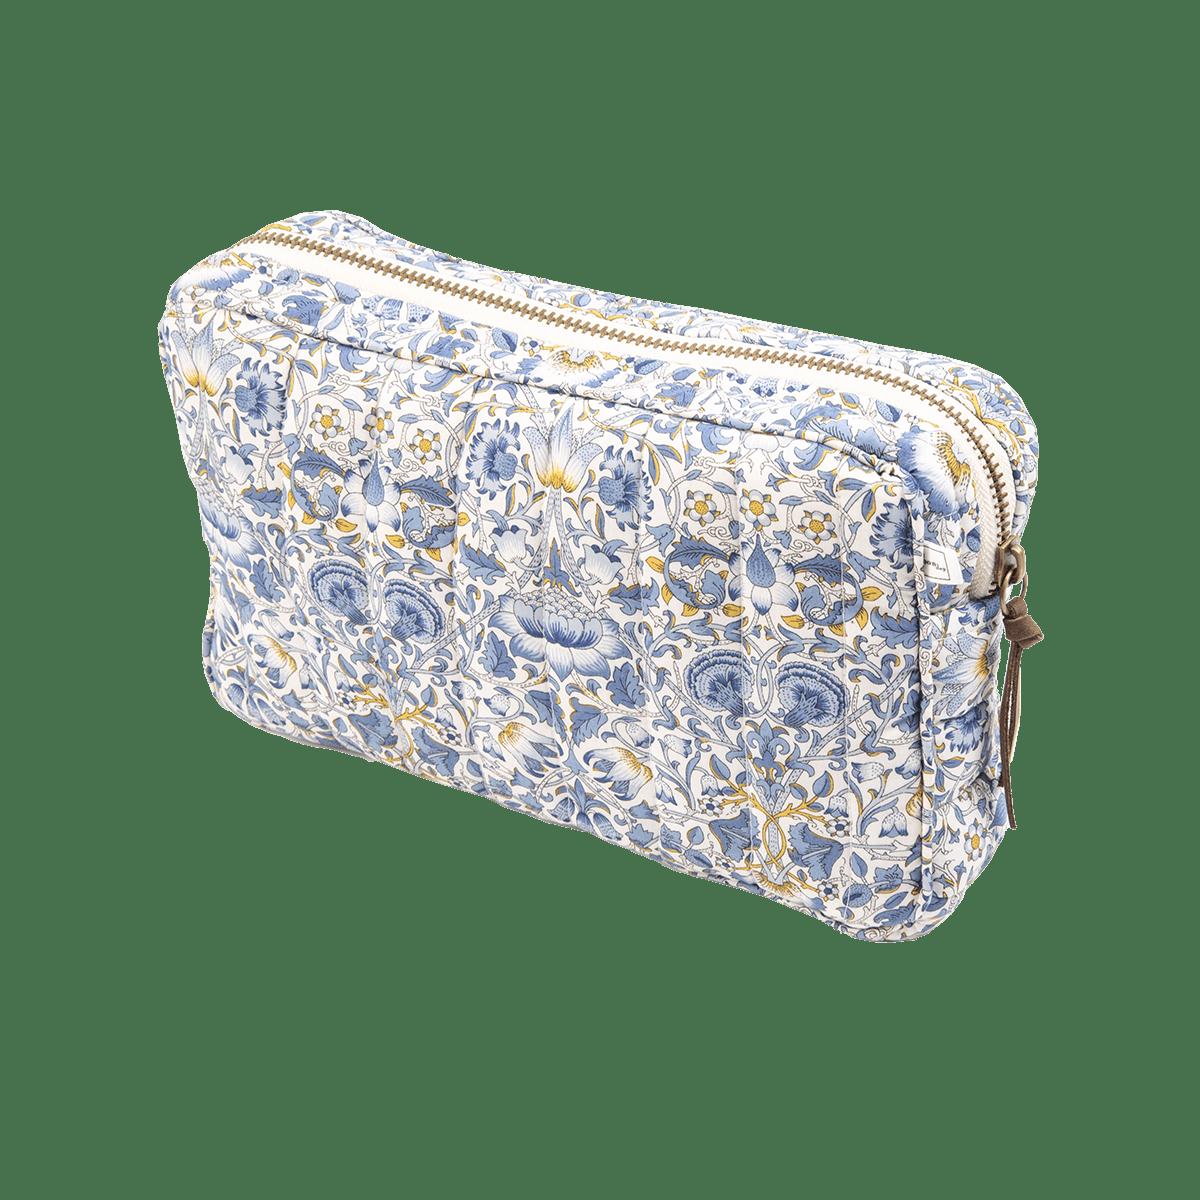 BON DEP - Liberty pouch SMALL Lodden